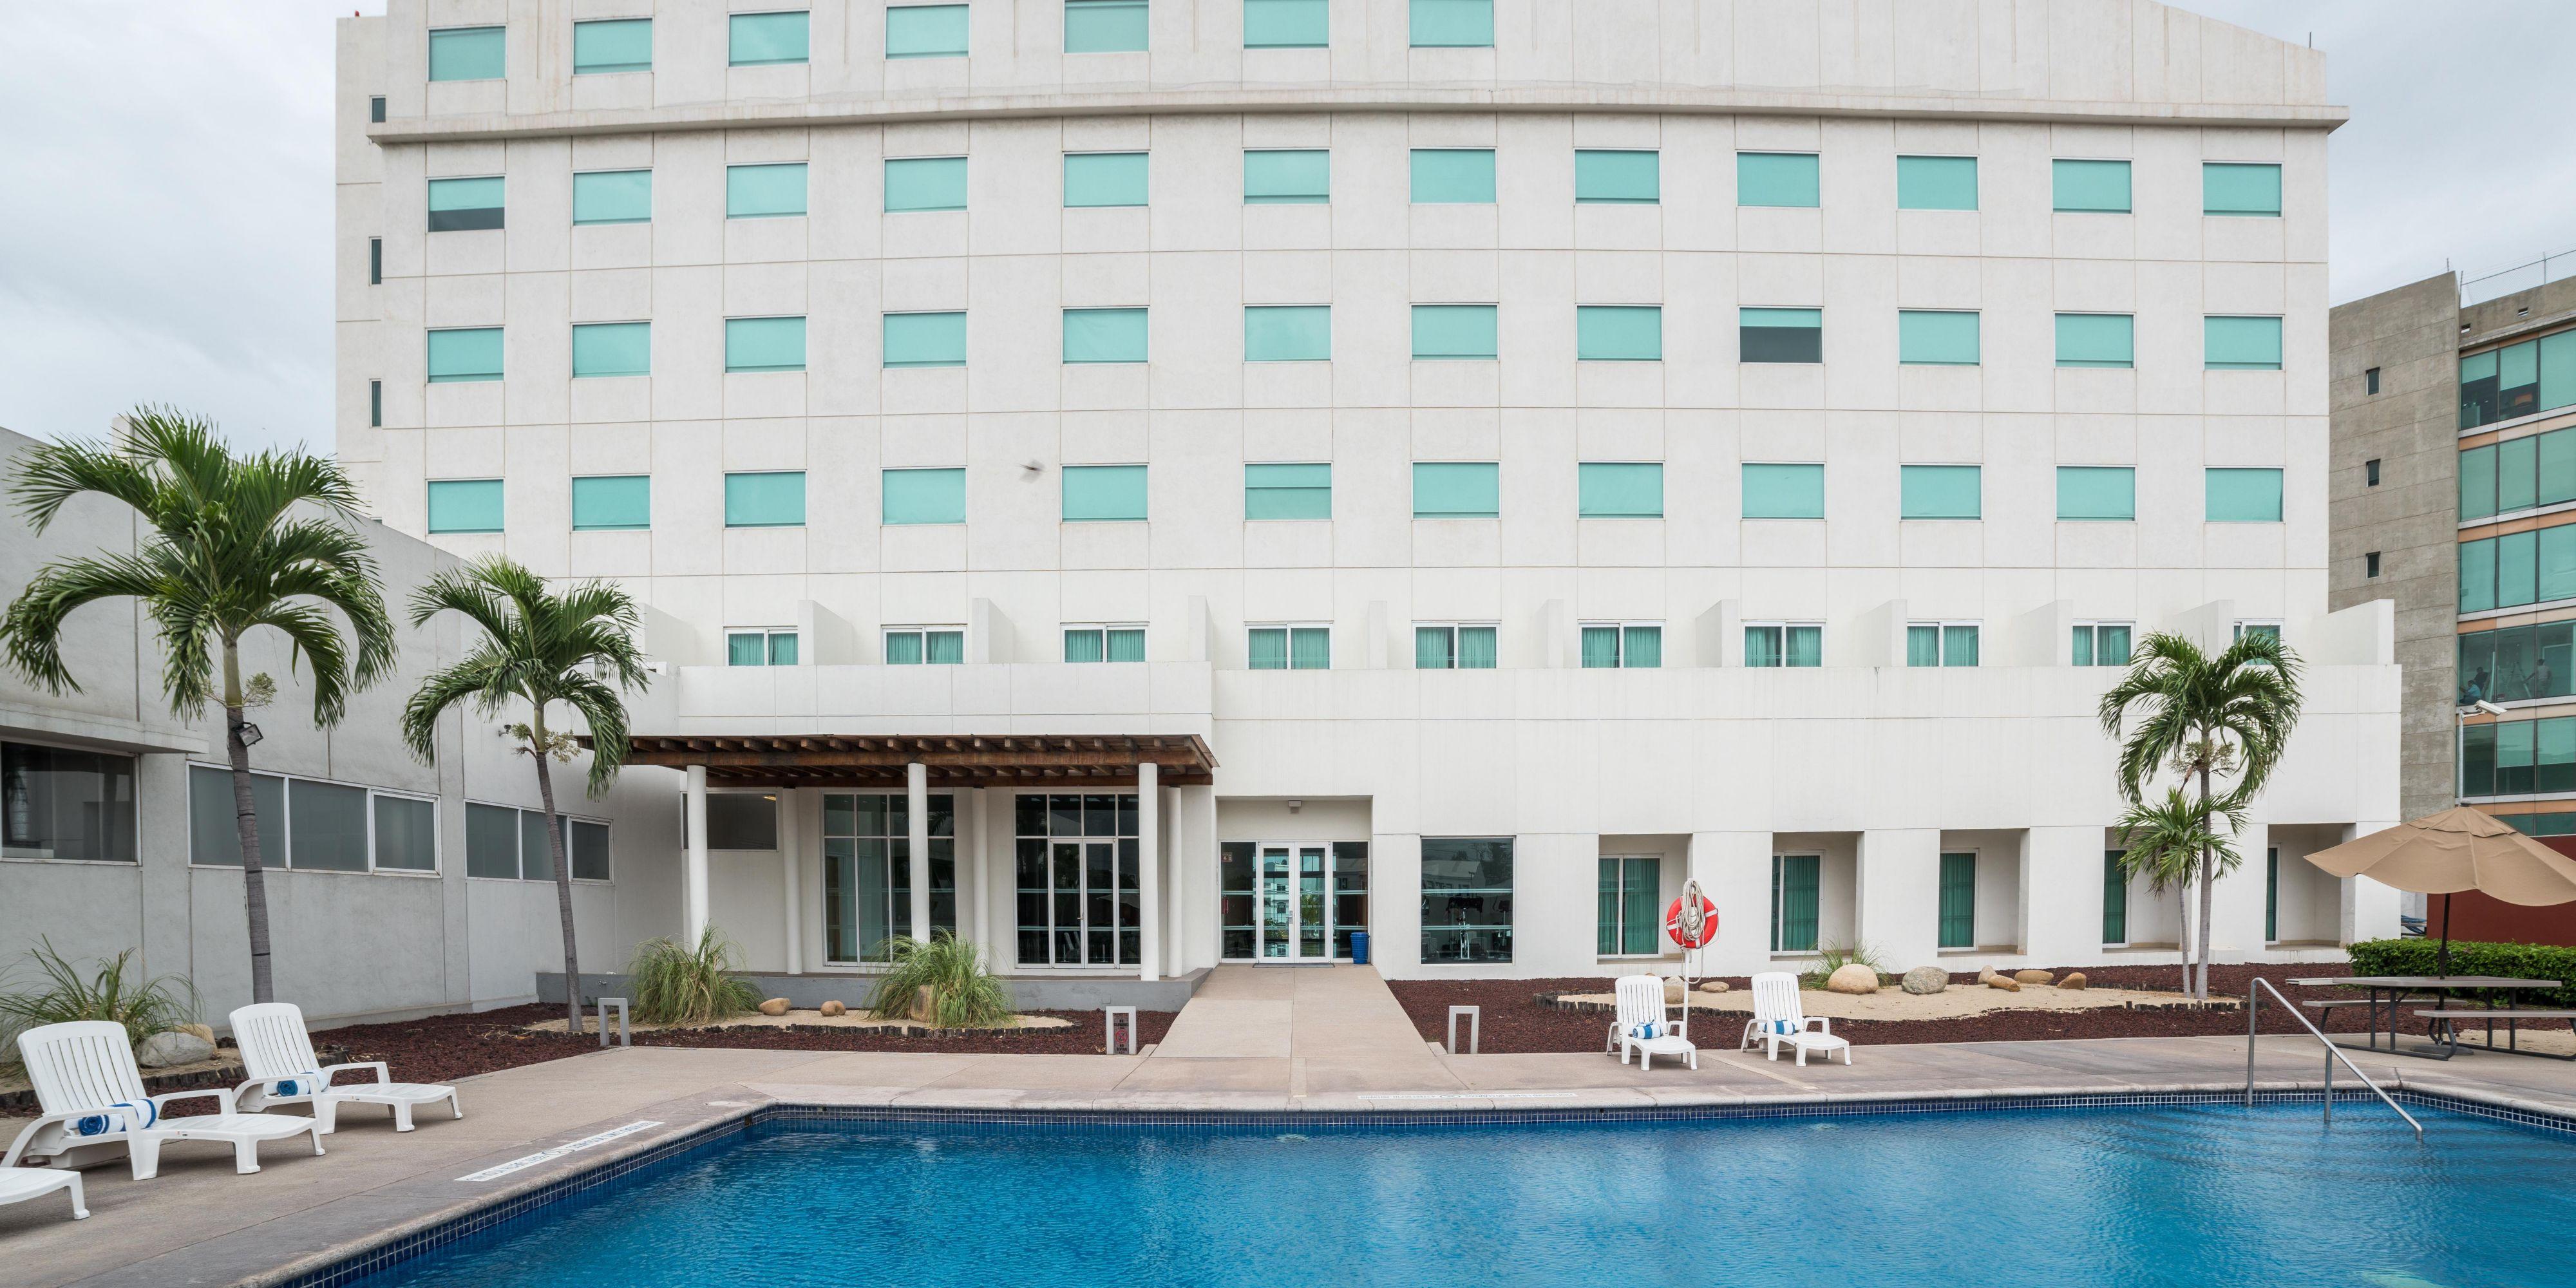 Holiday inn express manzanillo hotel by ihg holiday inn express manzanillo 4026521541 2x1 sciox Gallery